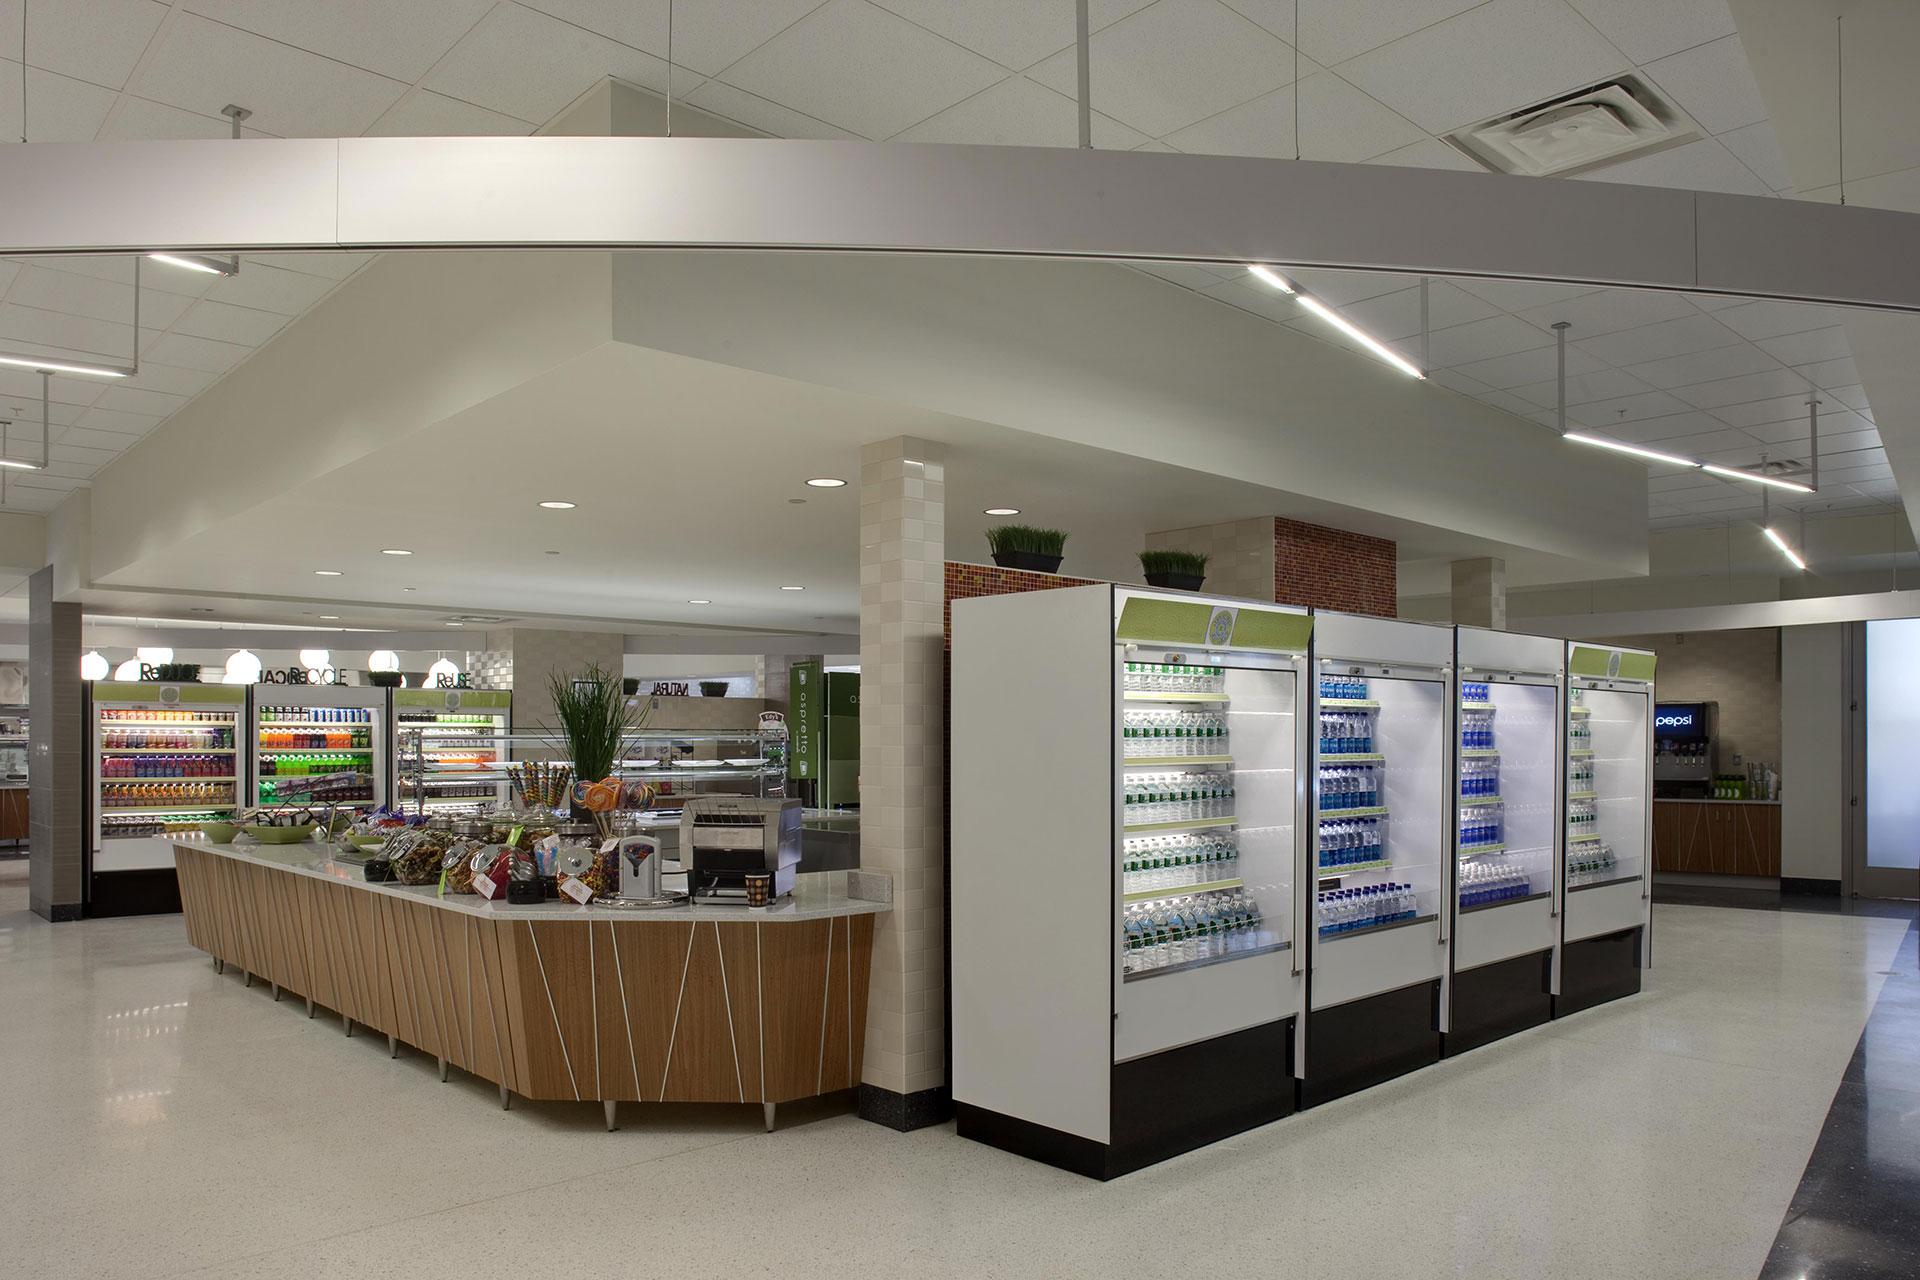 U.S. Food & Drug Administration Headquarters